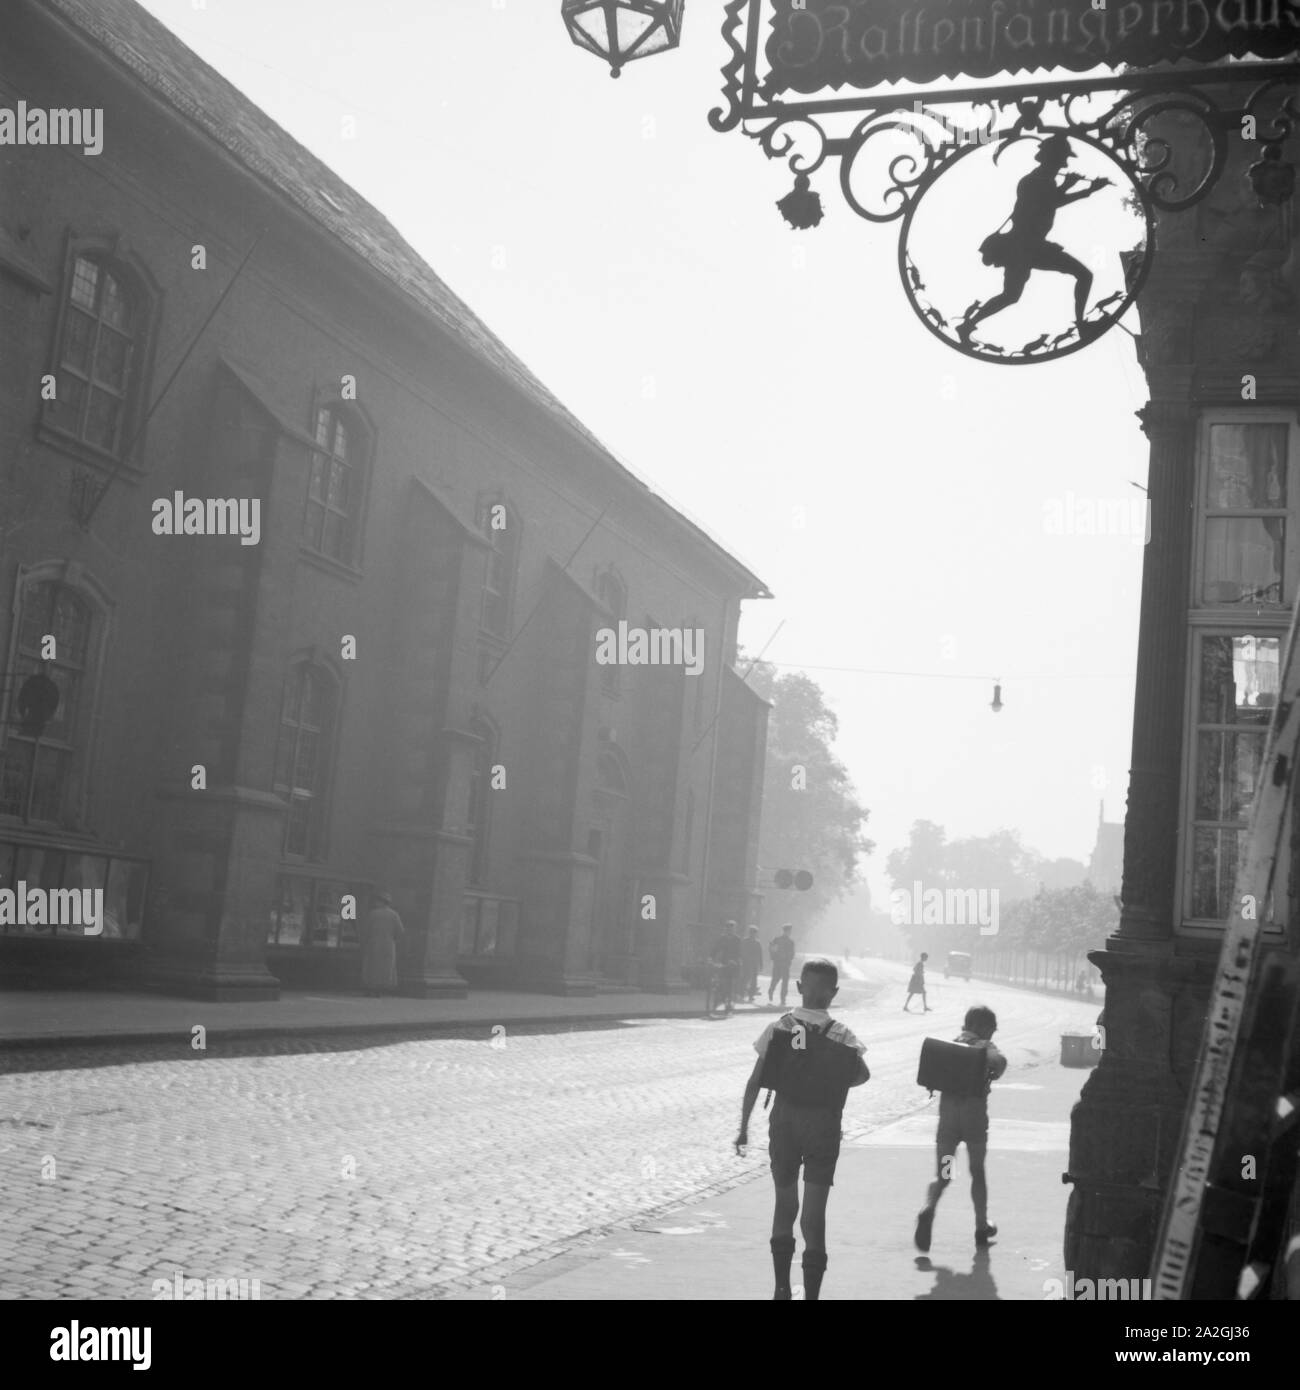 Schulkinder vor einem Haus mit dem Rattenfänger Symbol in Hameln an der Weser, Deutschland 1930er Jahre. School kids in front of a house with the Pied Piper's symbol at the old city of Hameln on river Weser, Germany 1930s. Stock Photo